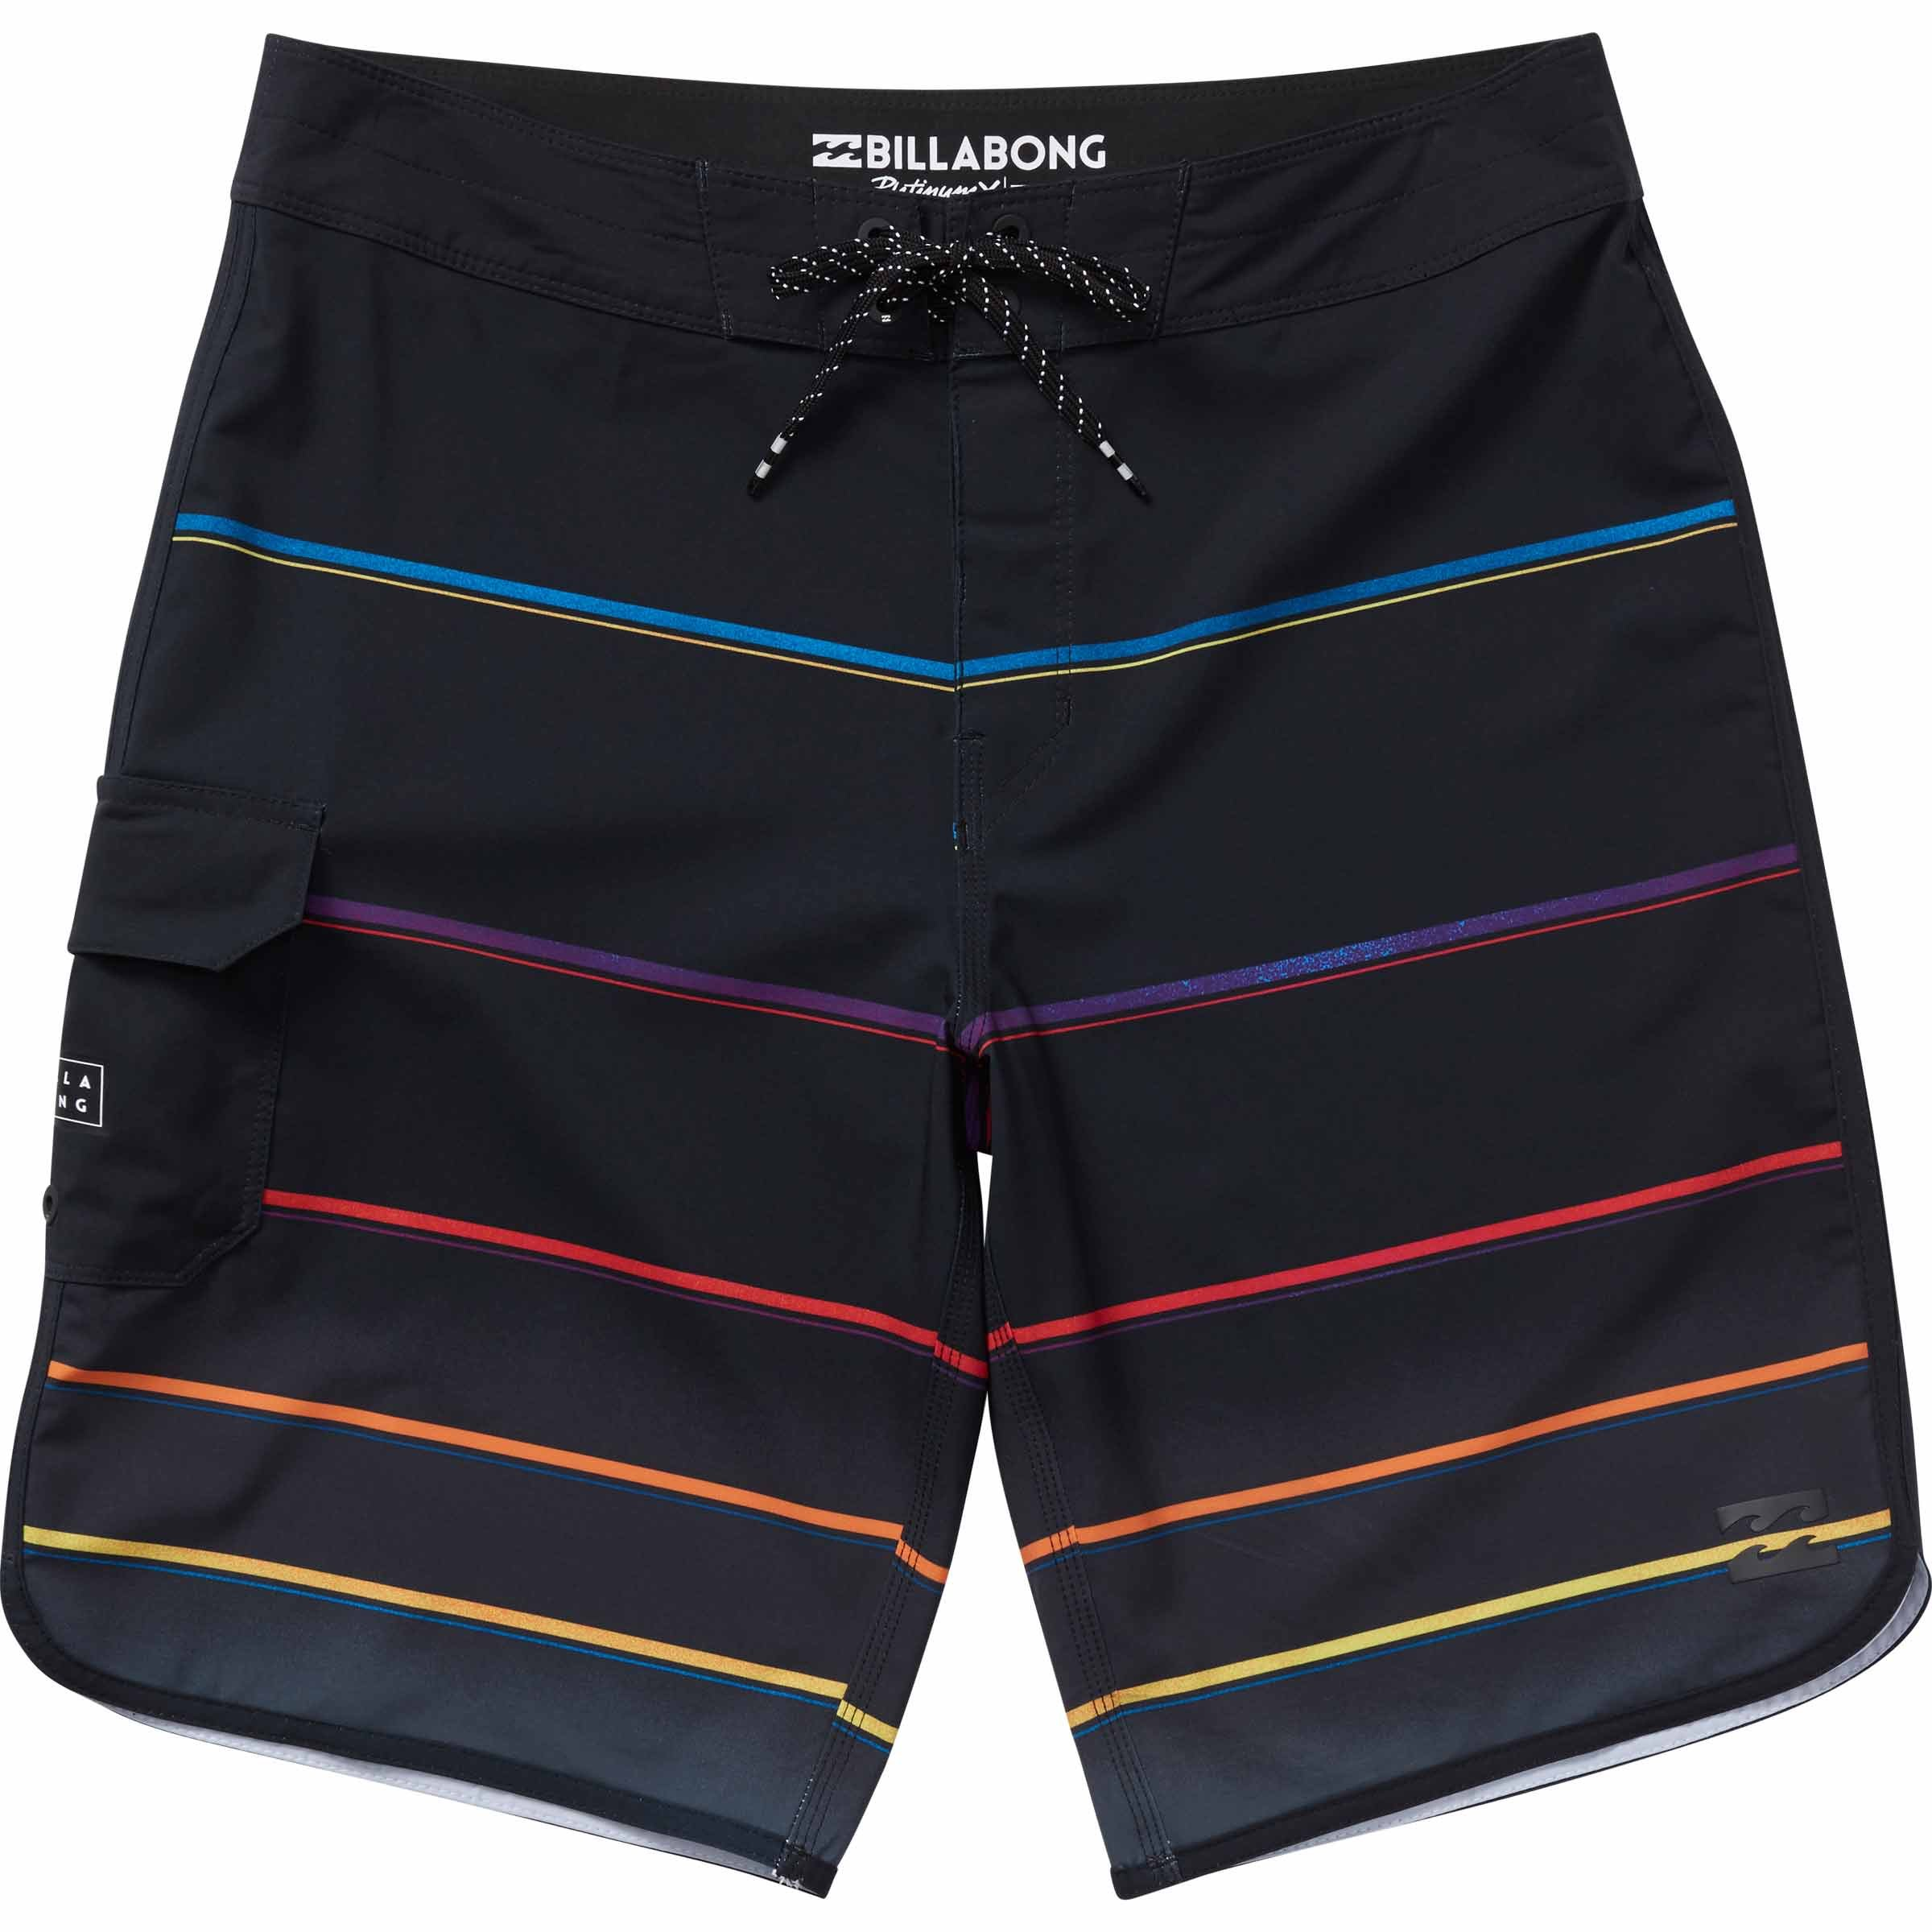 Billabong Men's 73 X Stripe Boardshort, Black, 40